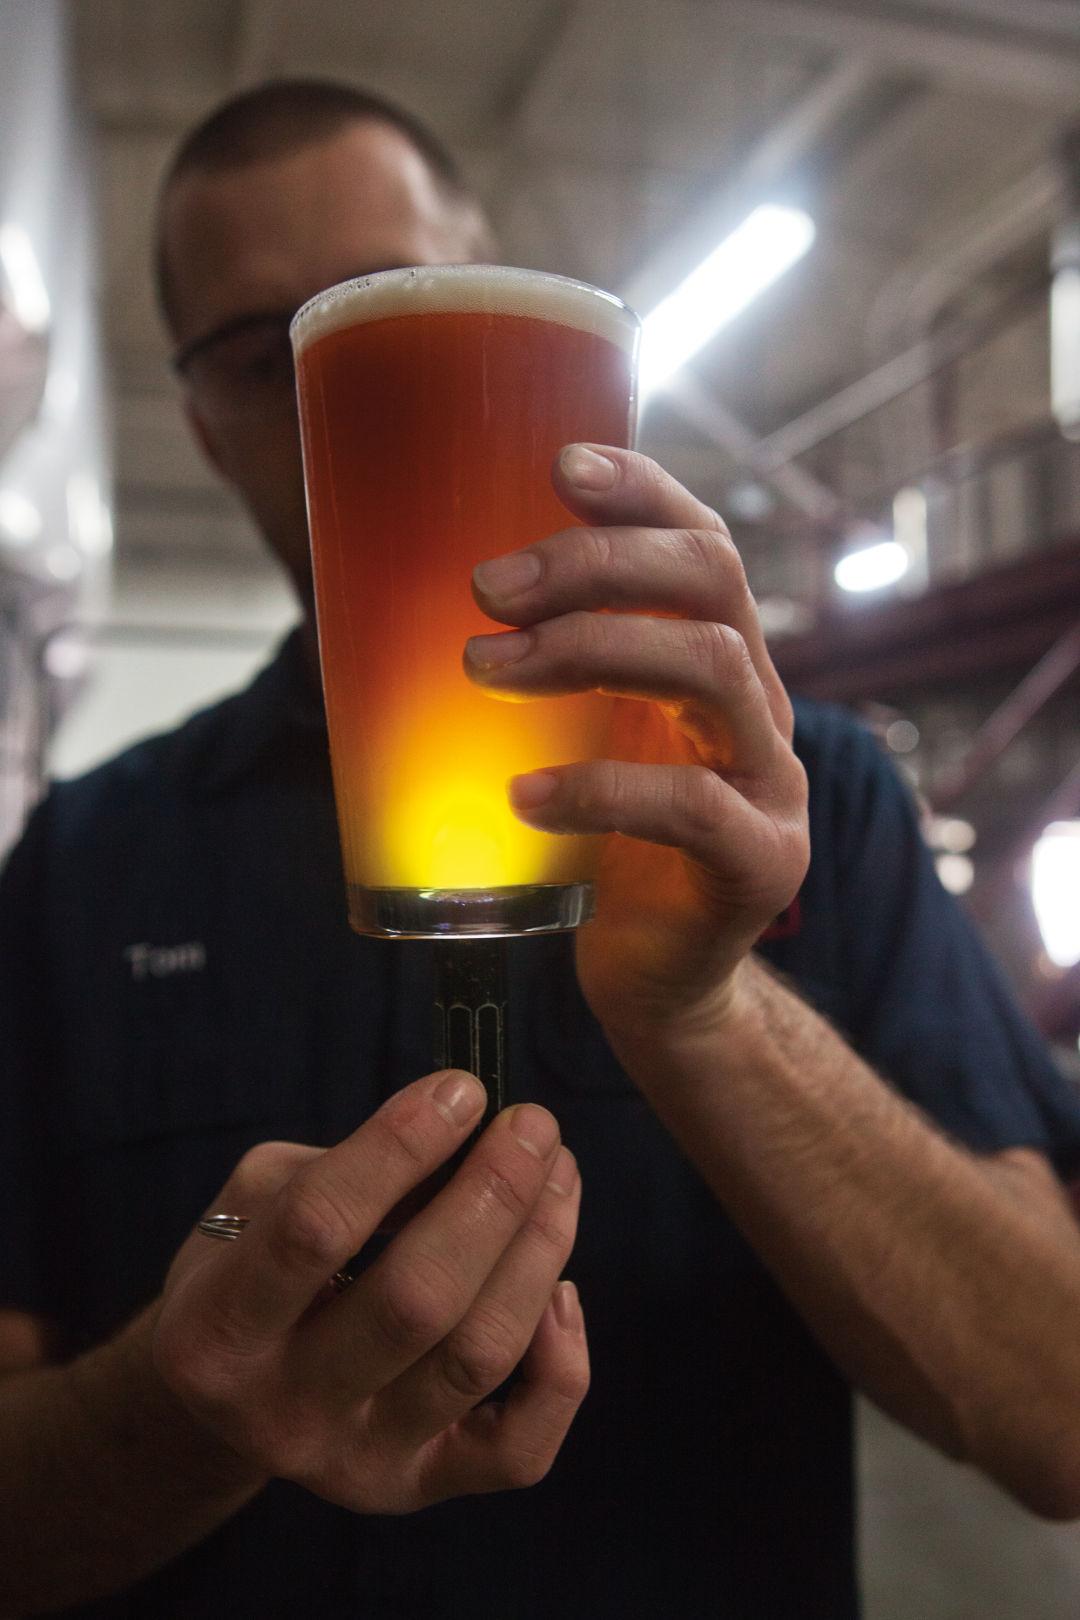 Smet mannys brewery 5d 078 v2 trpqkq